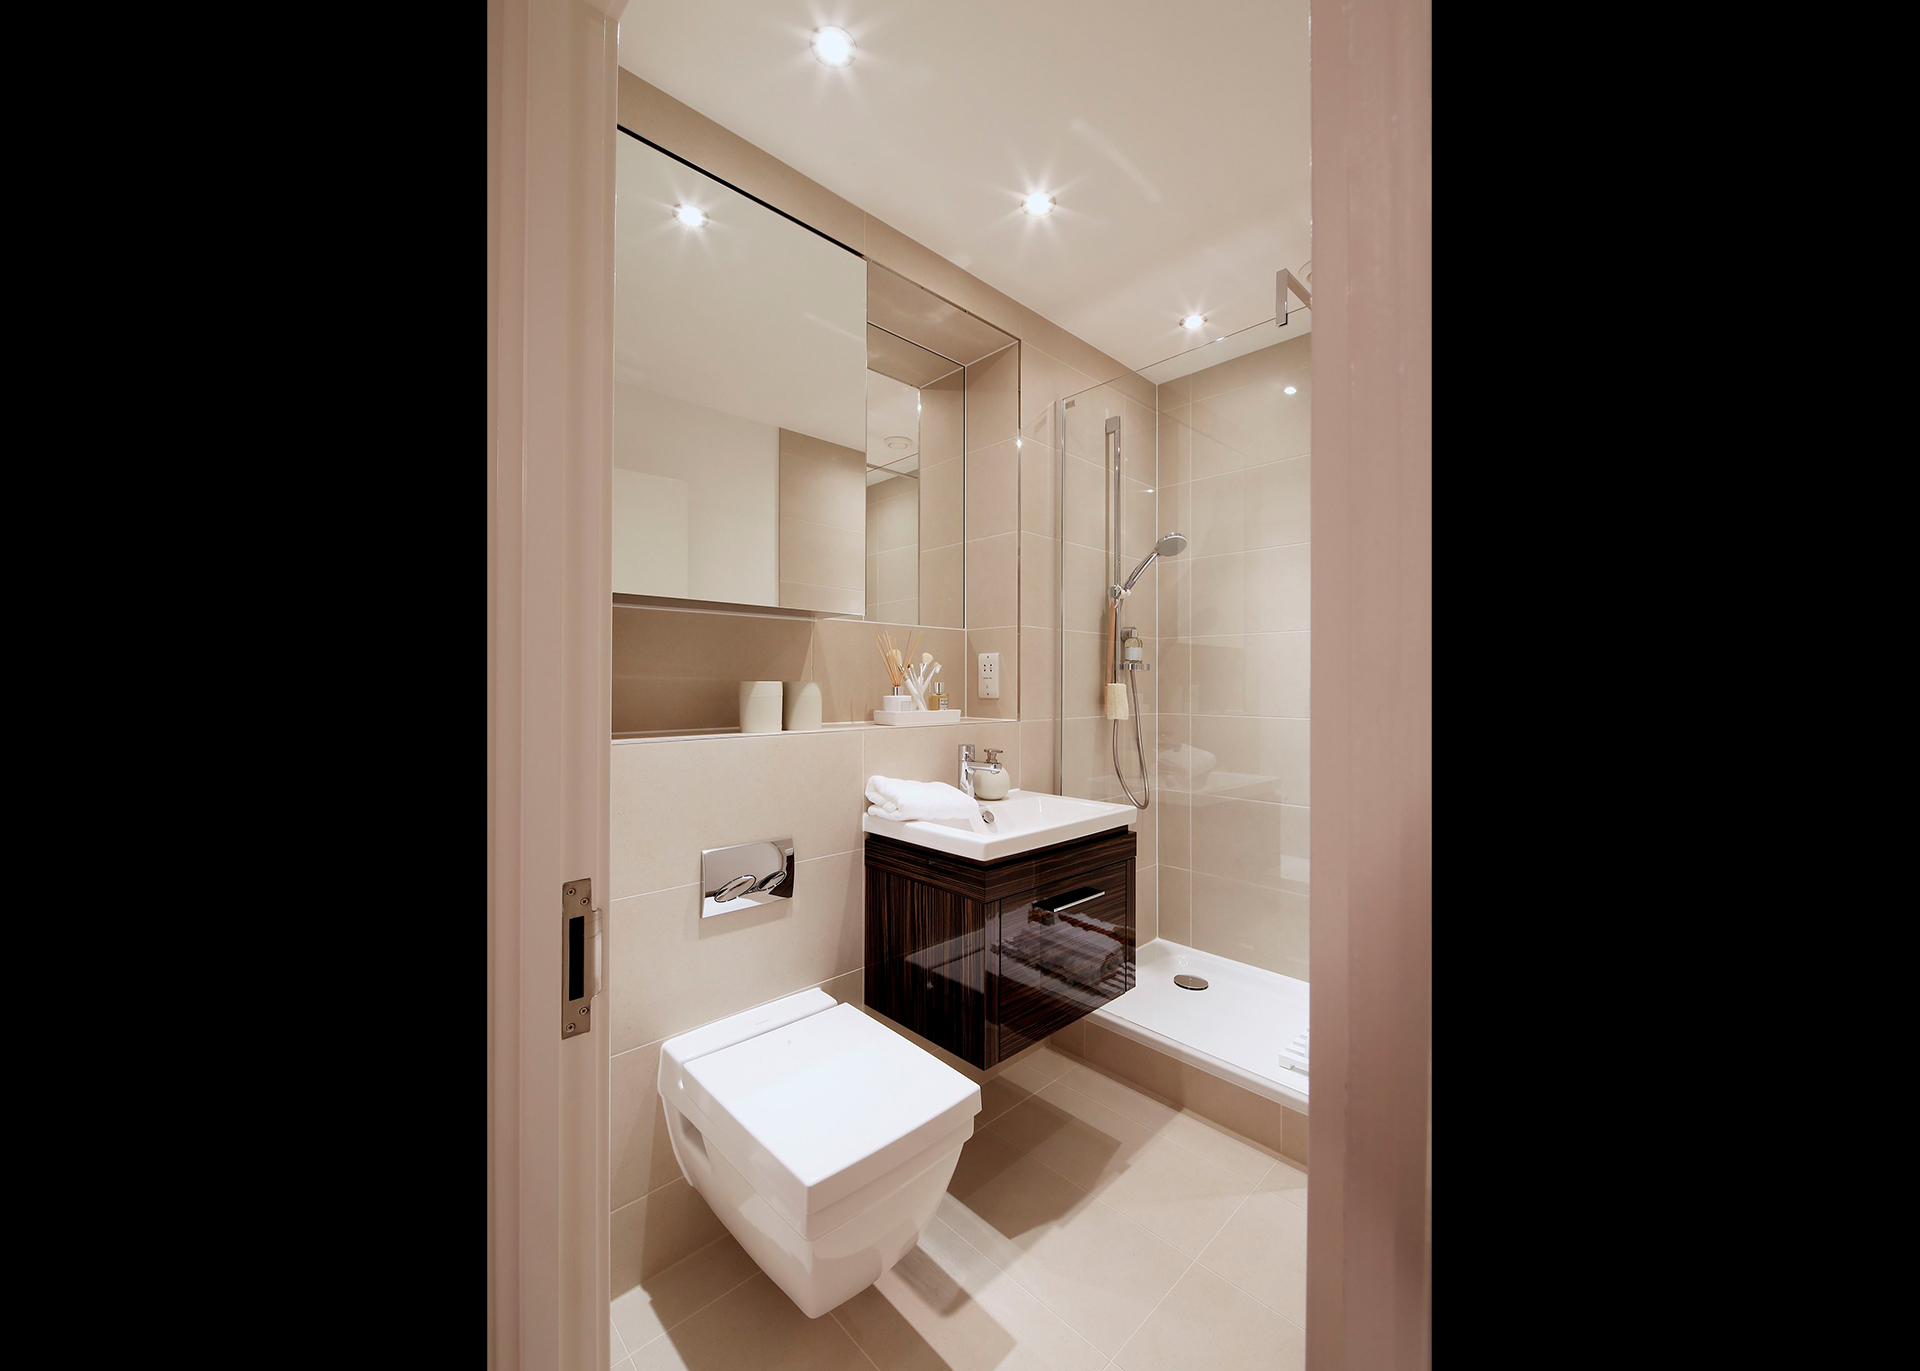 B439 Millias House Castle Quay Bathroom apartment